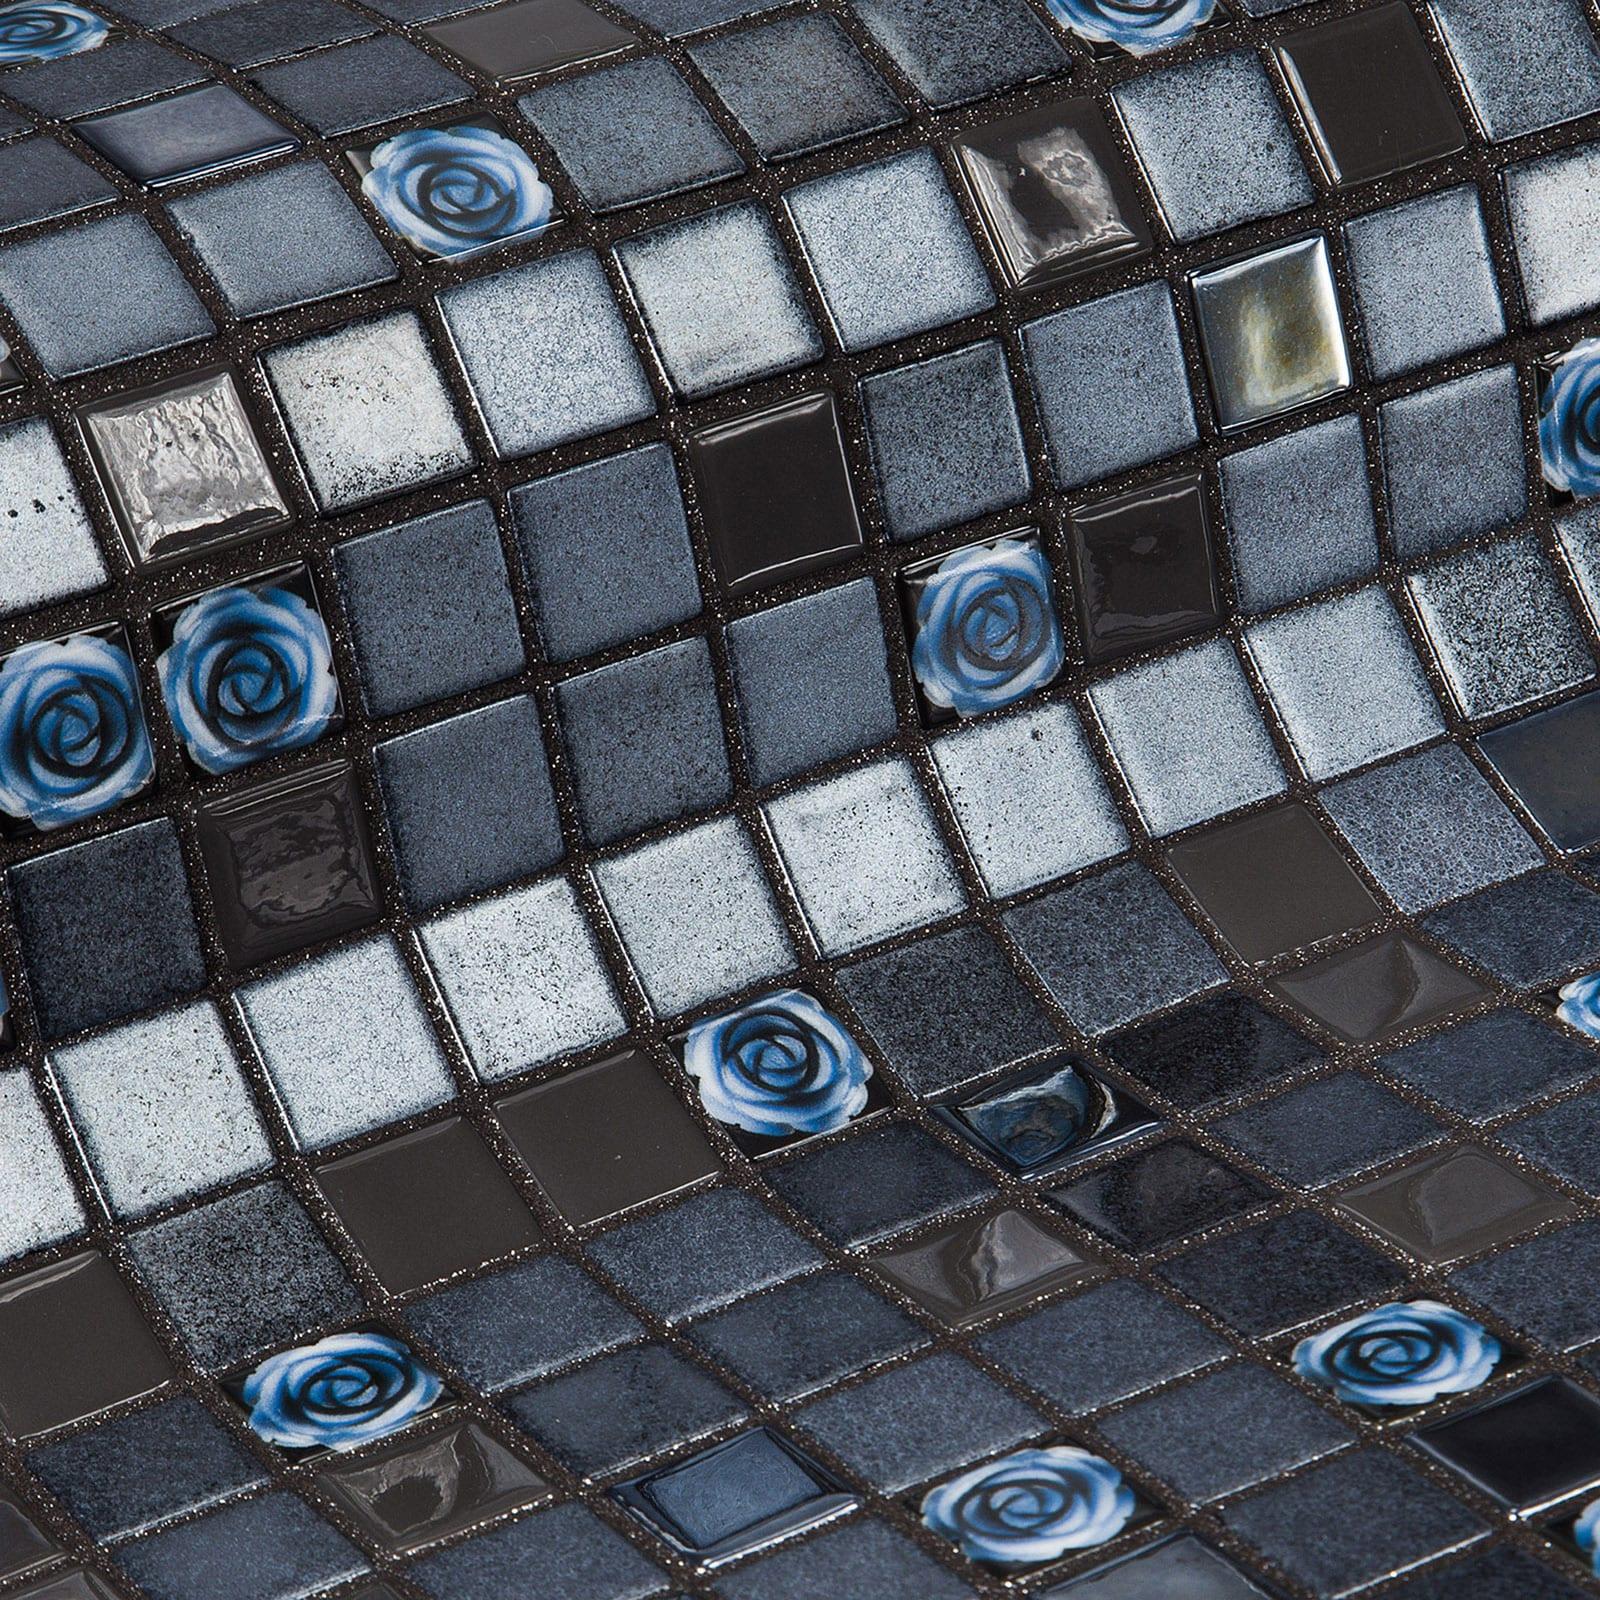 4-Roses-Topping-Mosaic-Ezarri.jpg